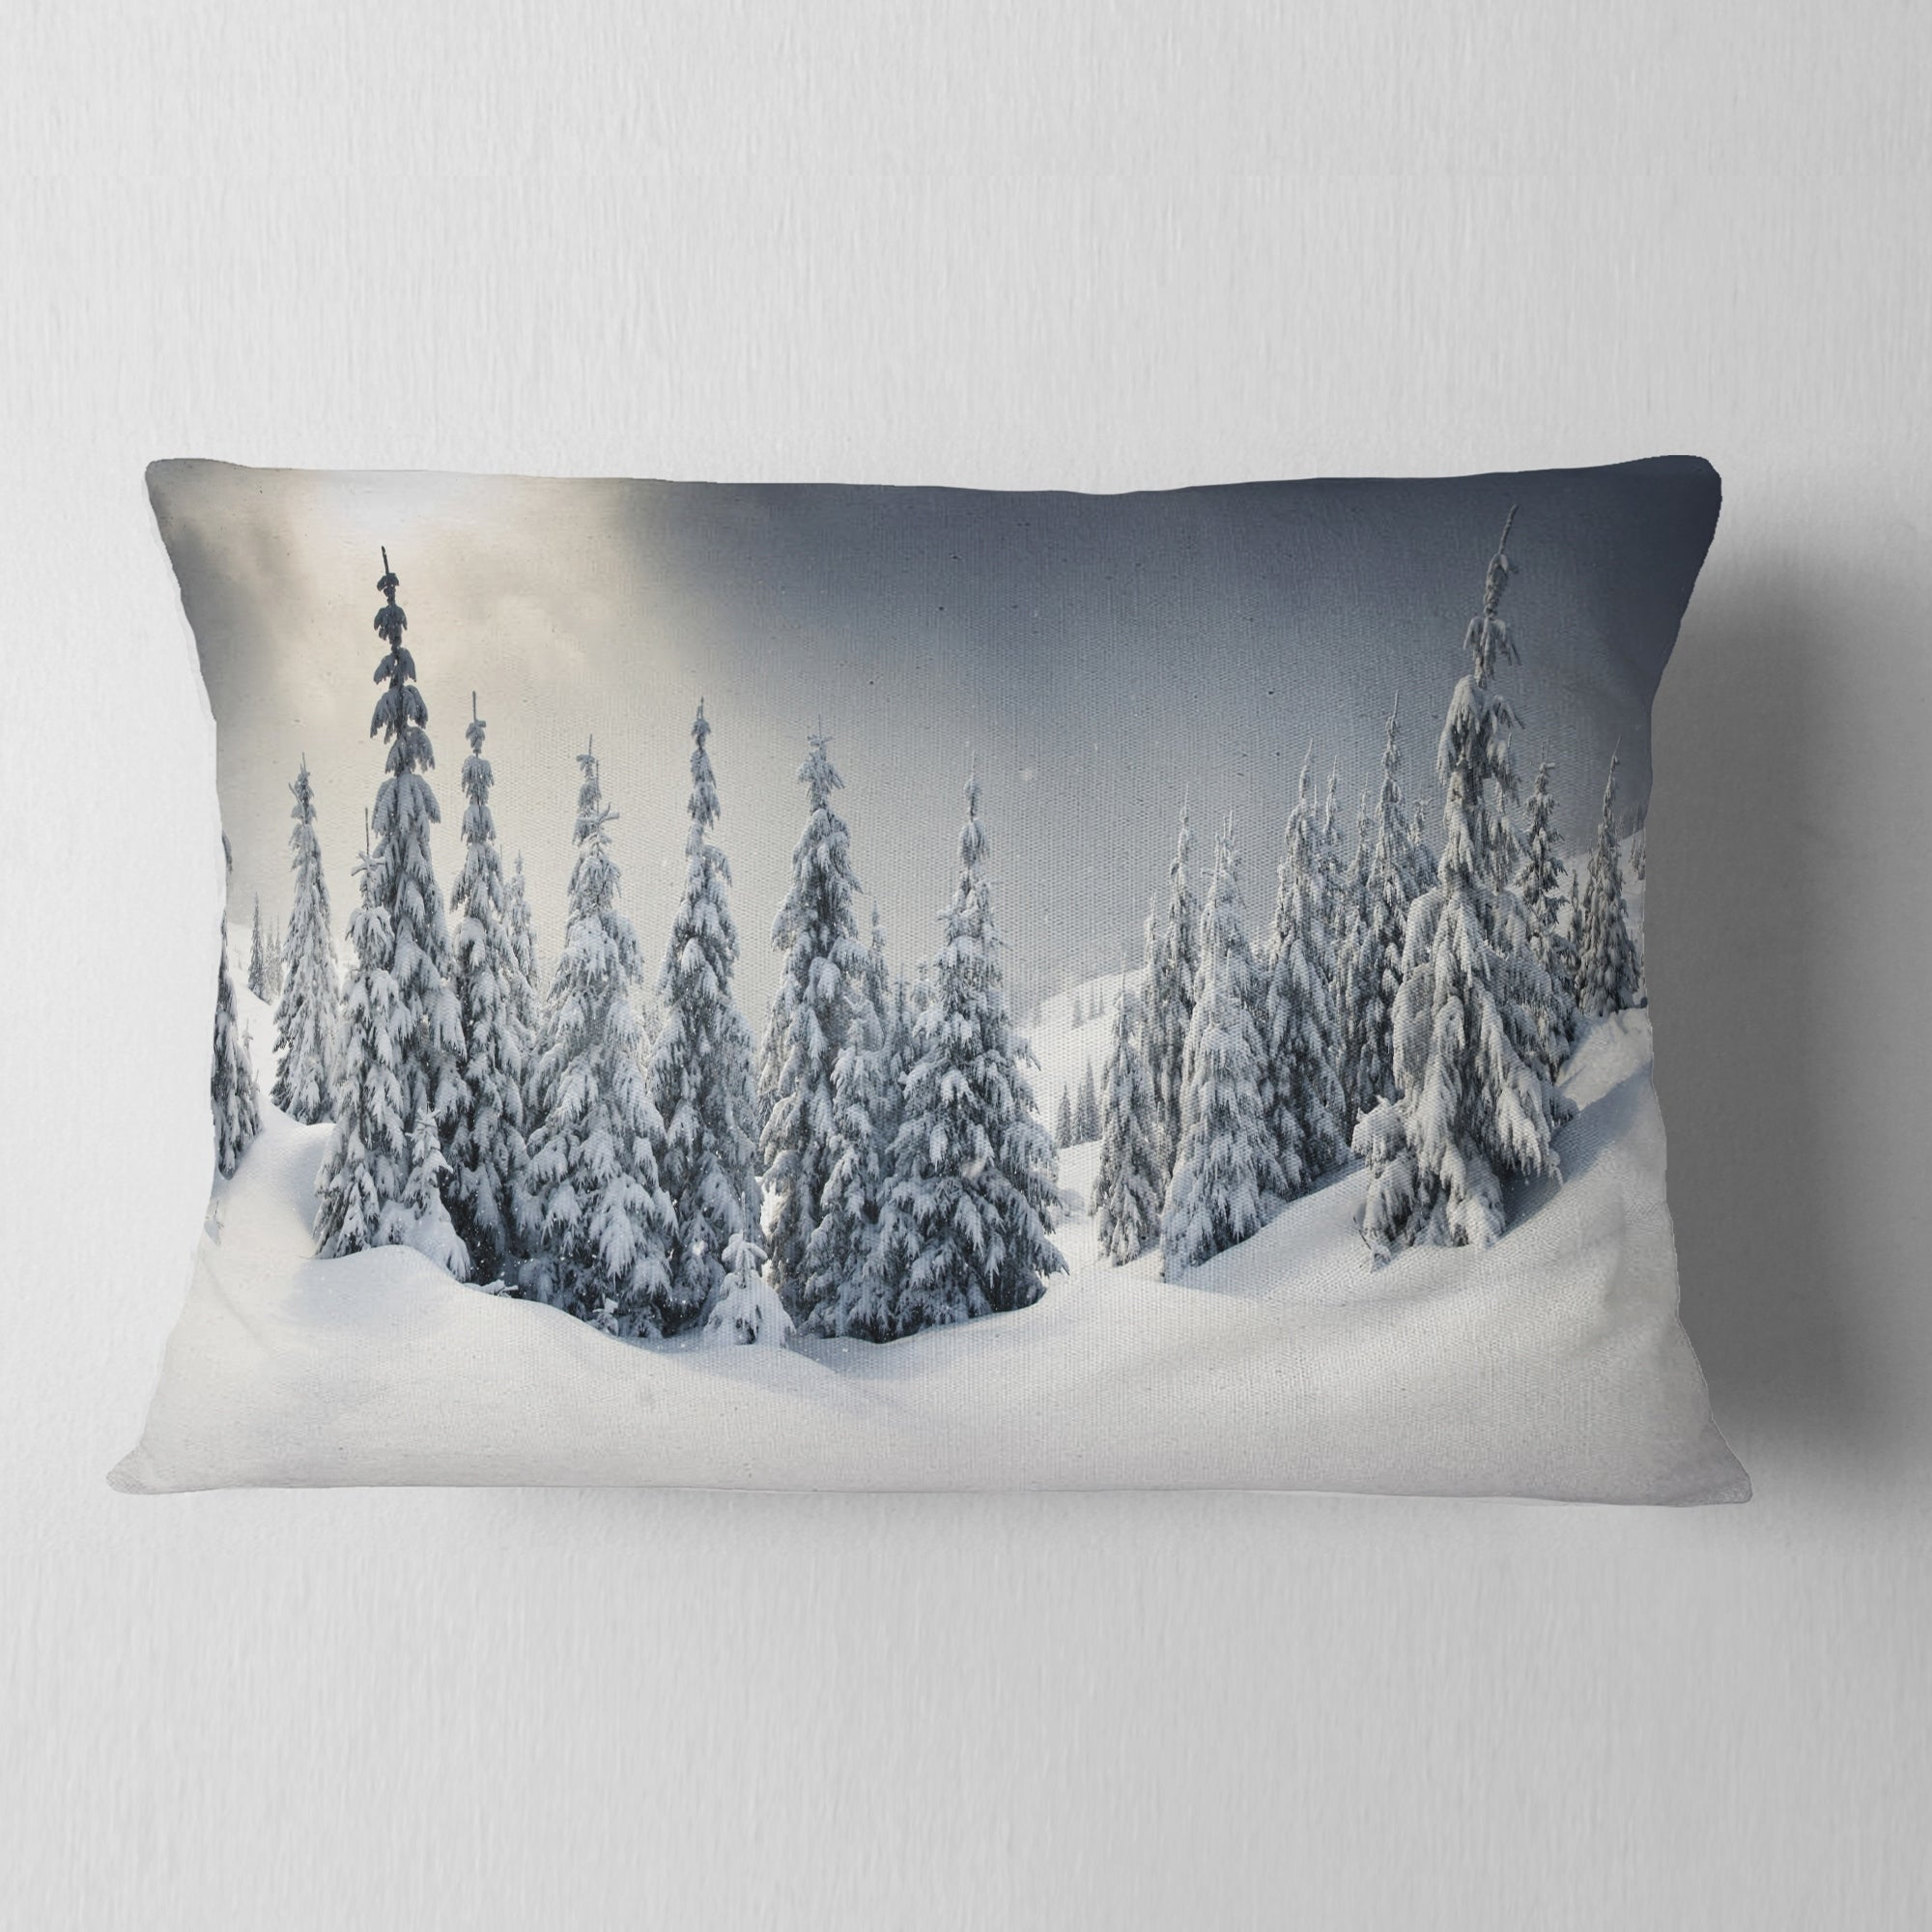 Designart Winter Landscape Photography Throw Pillow Overstock 20890173